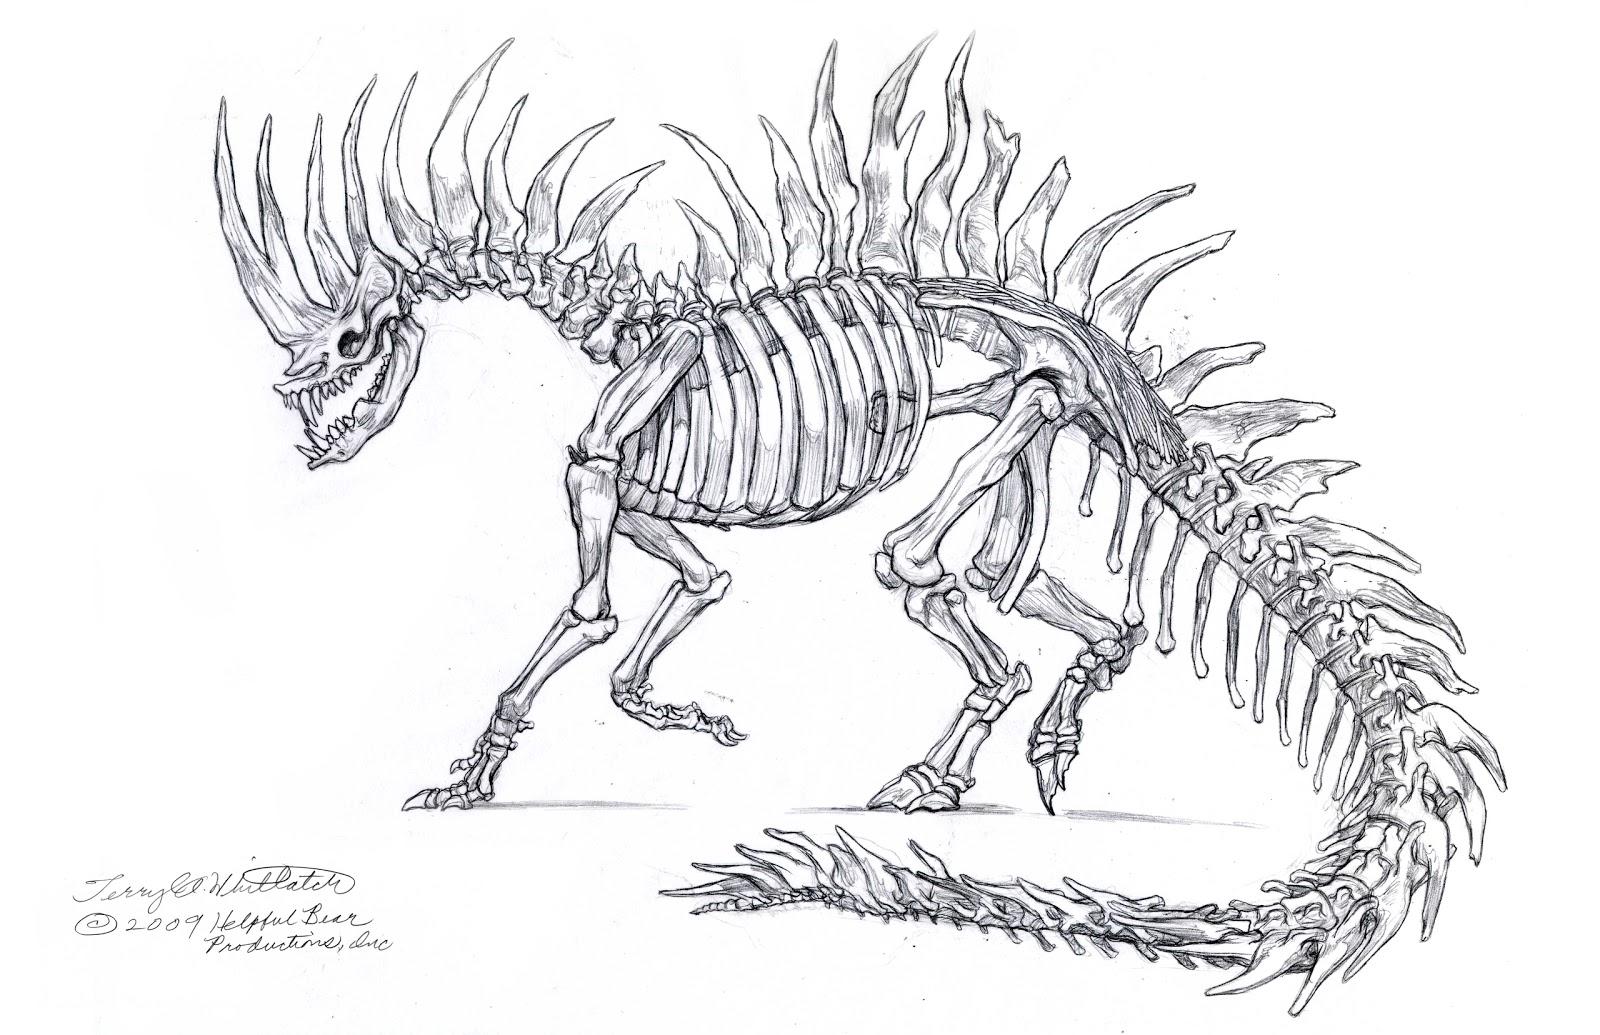 Clip Art Dinosaur Skeleton Coloring Pages dinosaur skeleton coloring page rex colouring pages free of skeleton